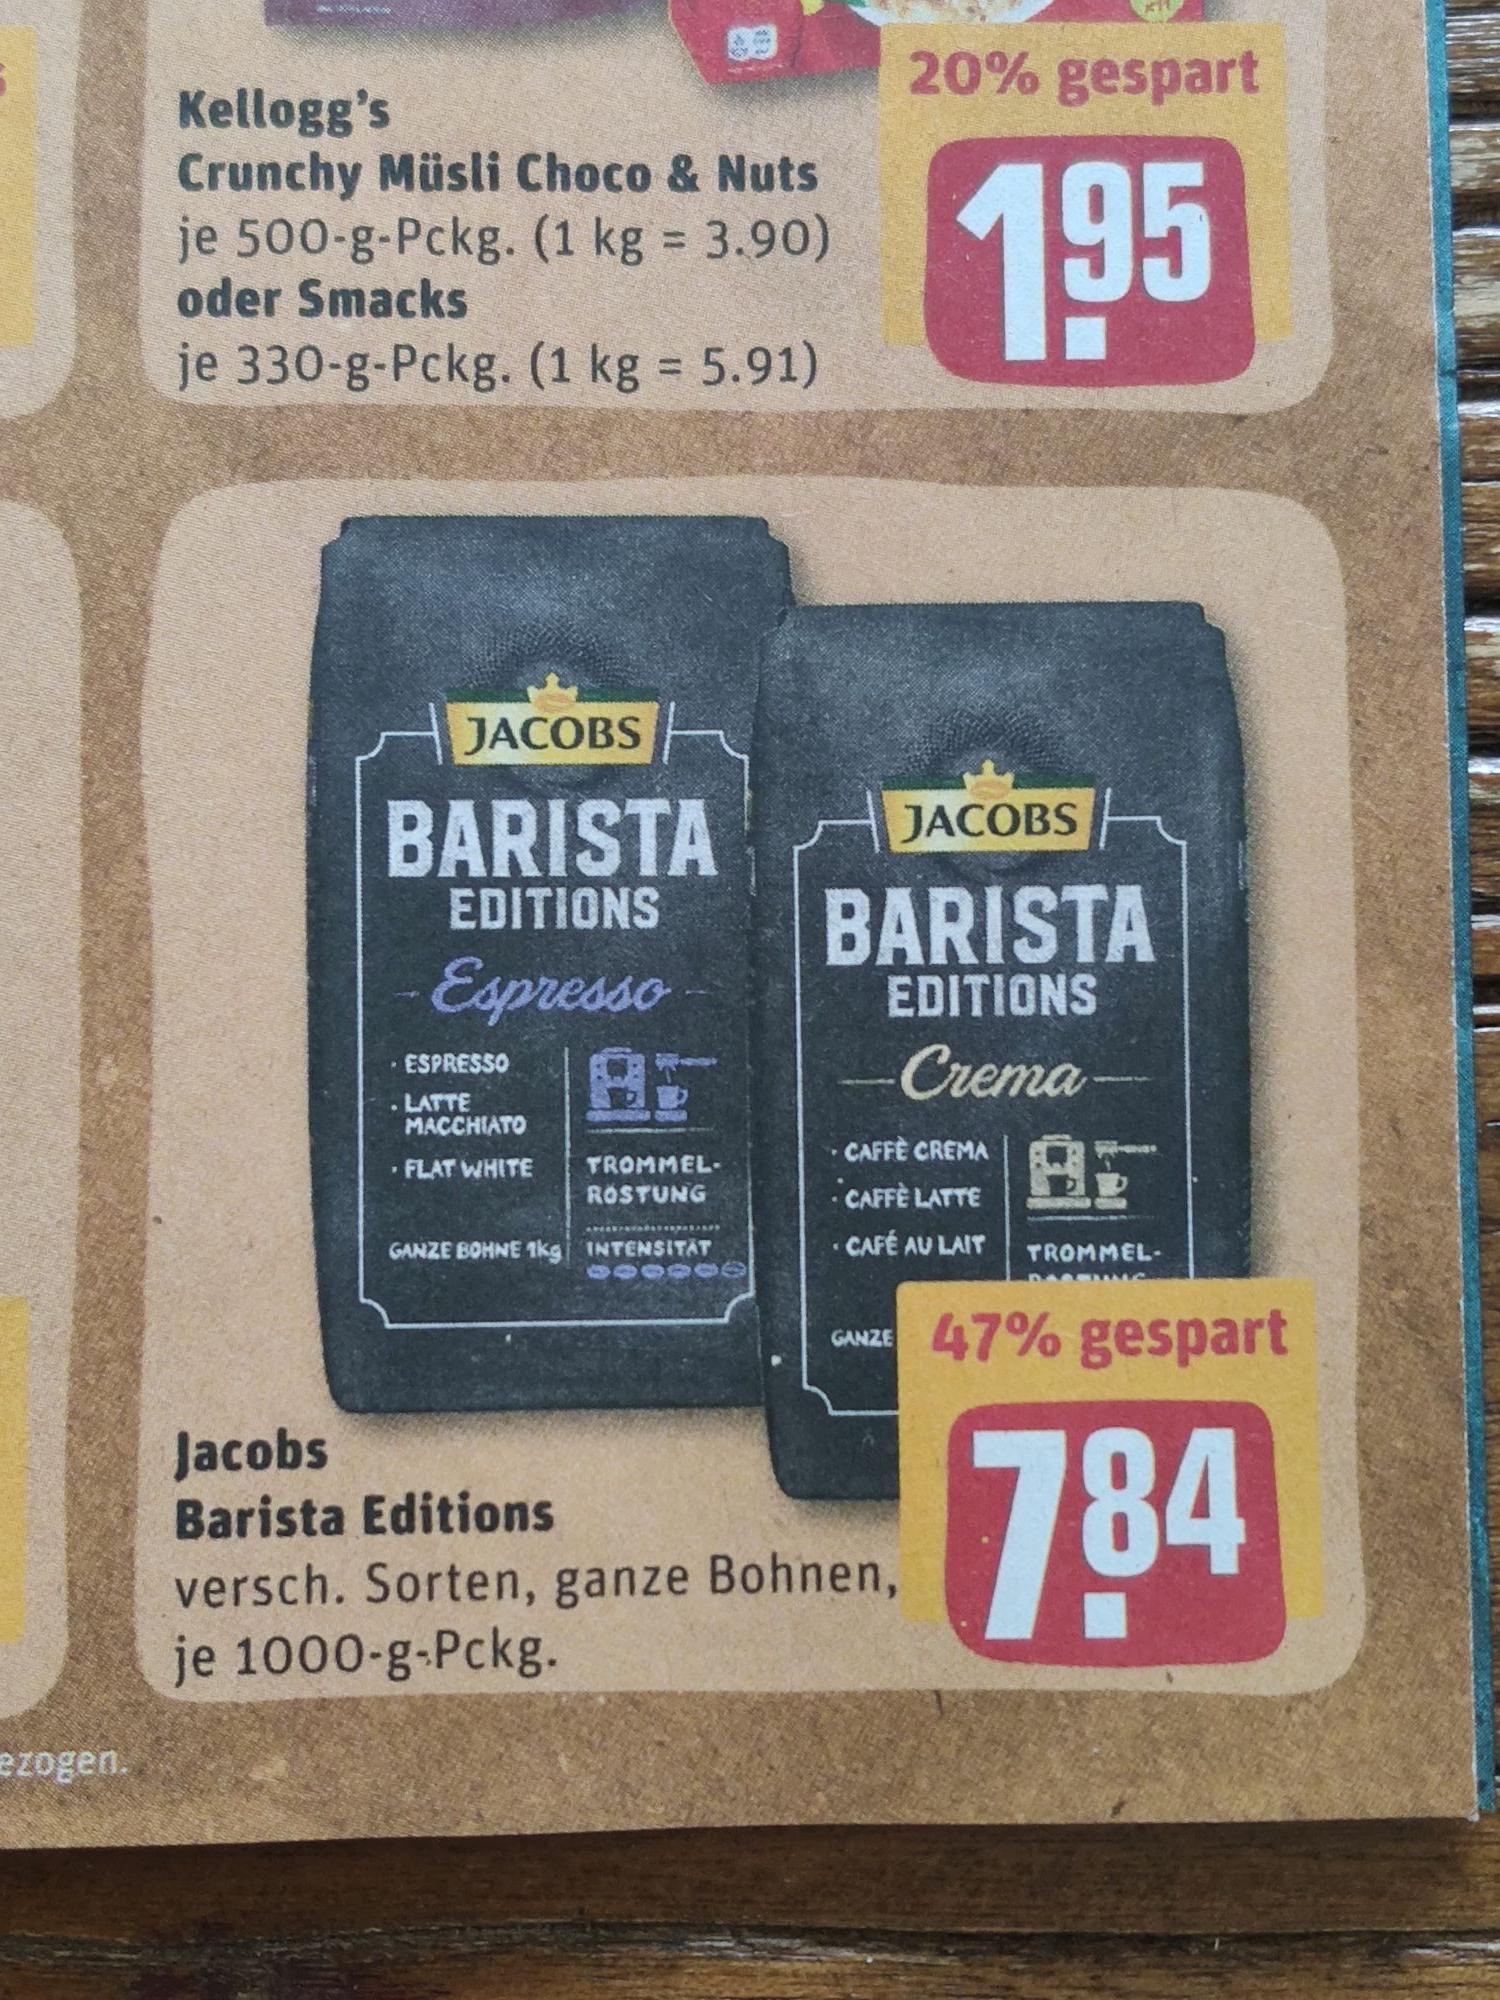 Jacobs Barista Editions ganze Bohnen [REWE]